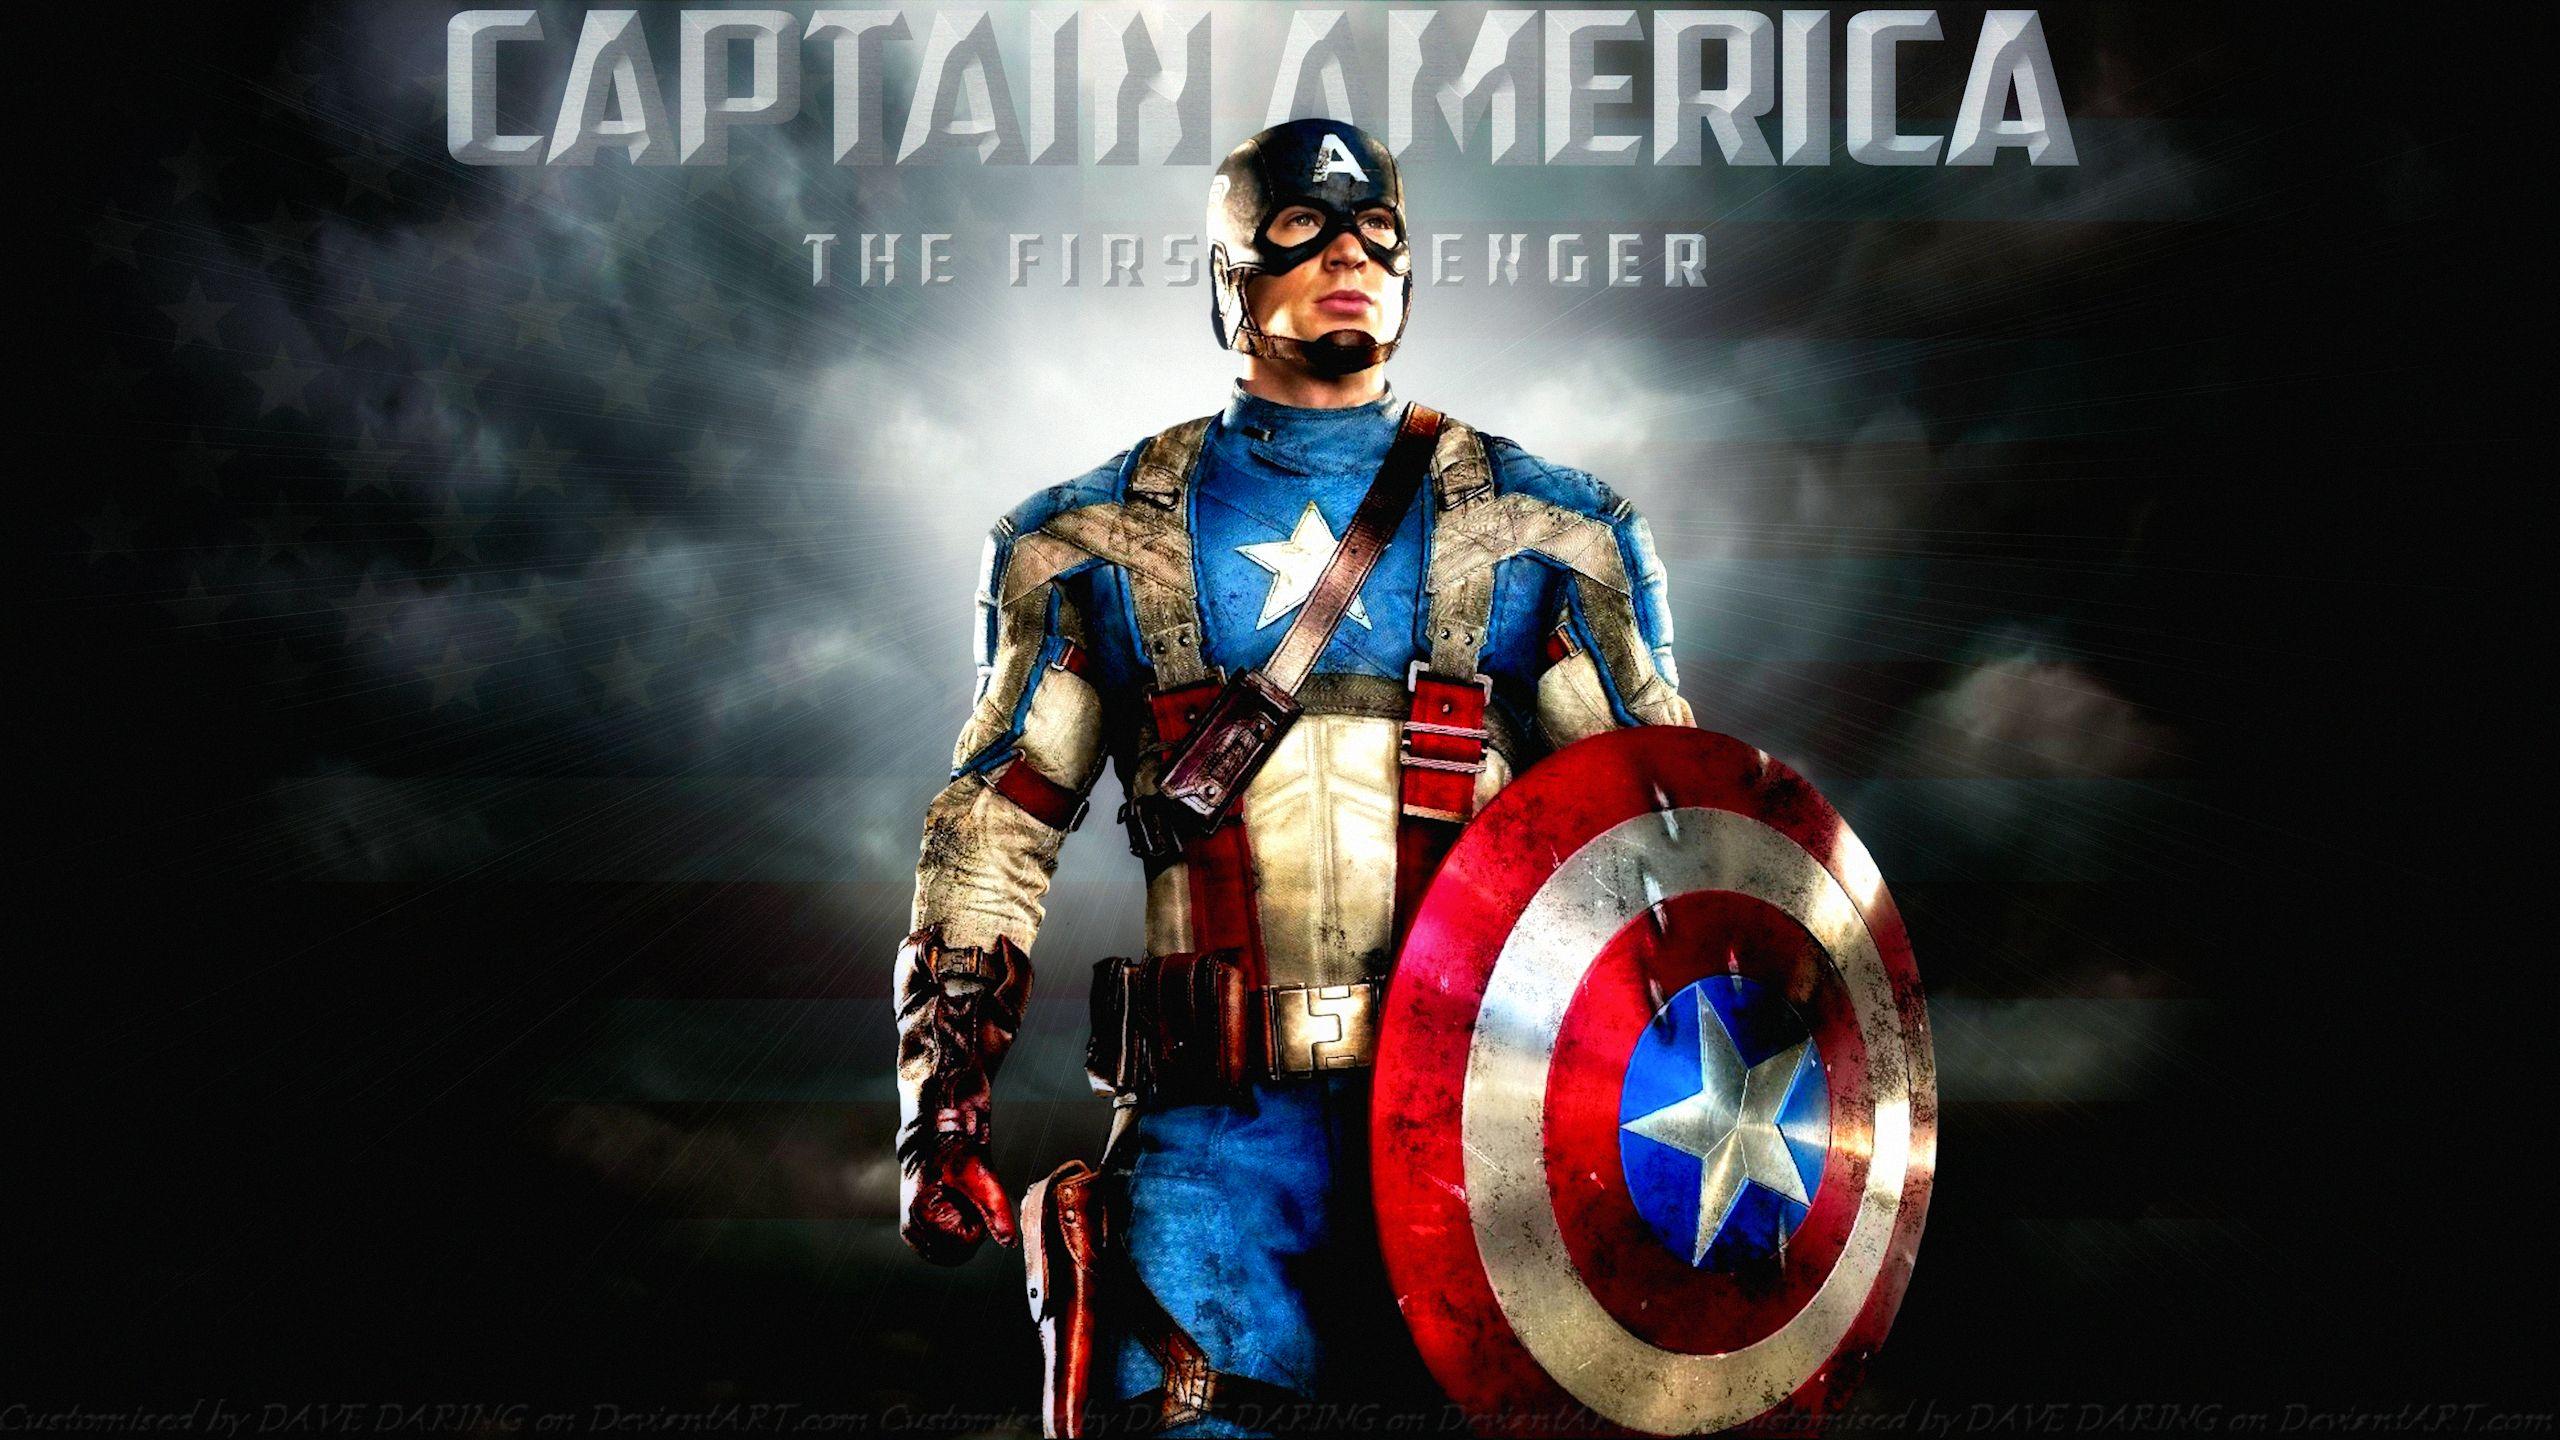 картинки на рабочий стол капитан америка цепь двигателя